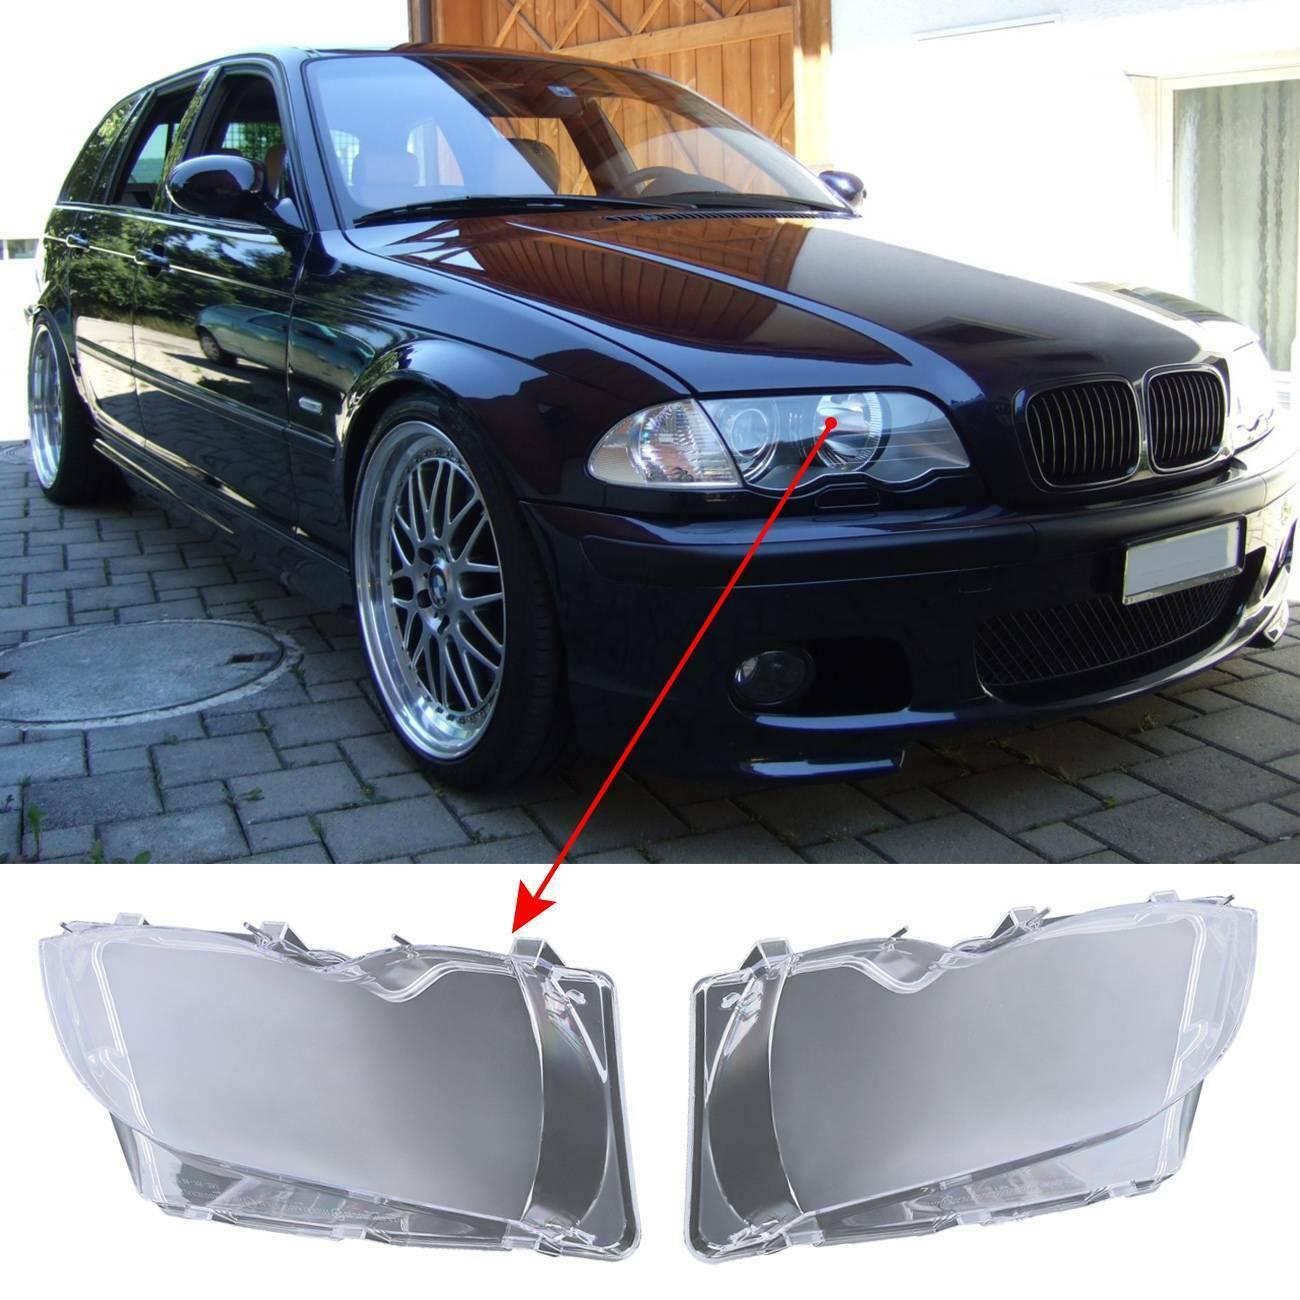 Samger 2PCS Headlight Lens For BMW E46 3er 4Door 2002 2003 2004 2005 Car Lights Head Lamp Cover Clear